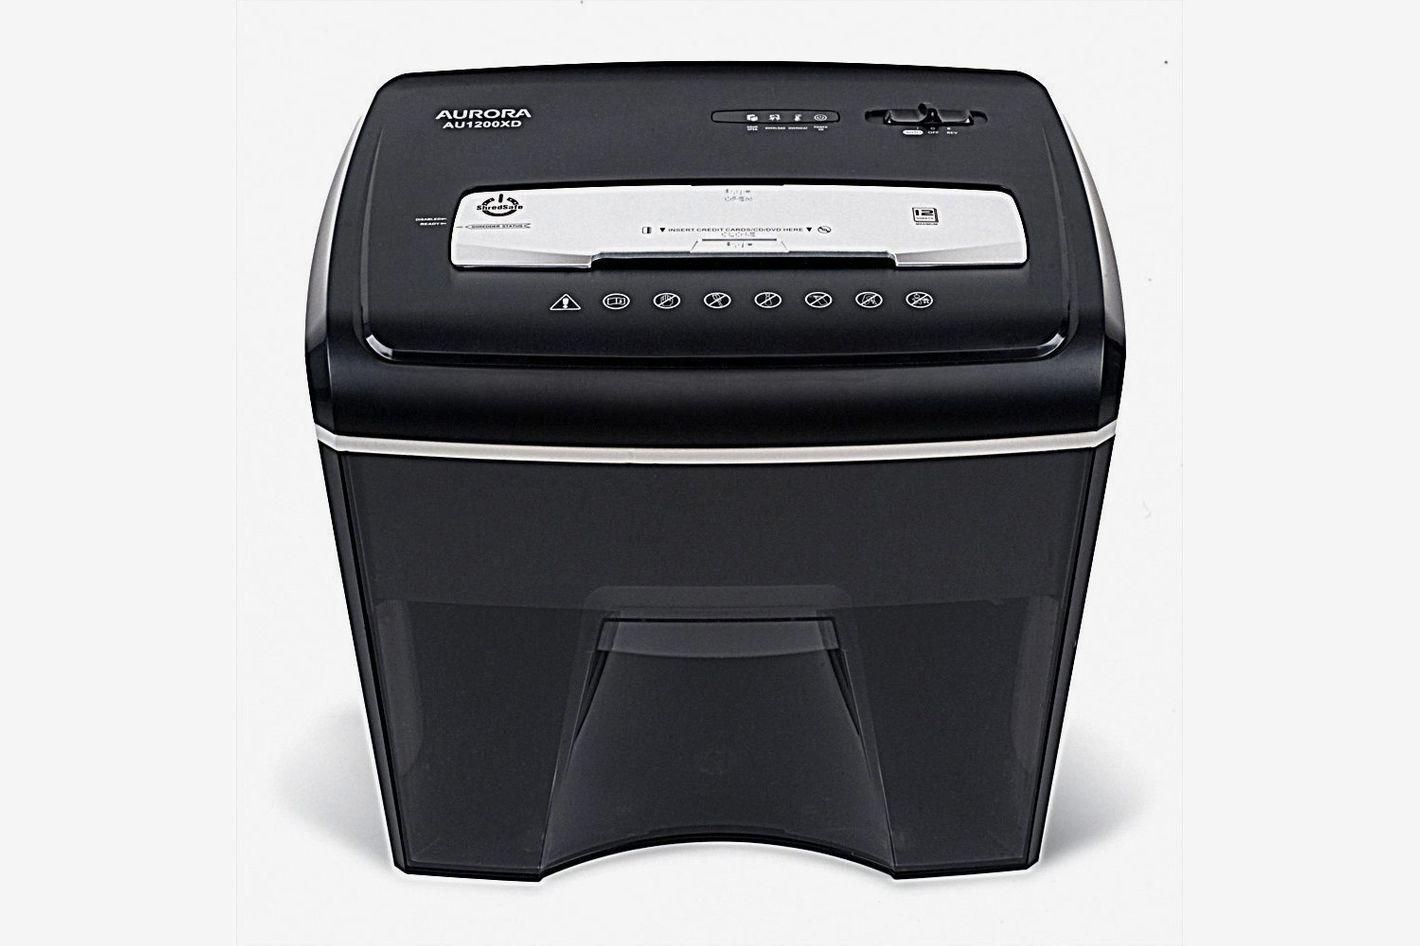 Best Desktop Paper Shredder Aurora Au1200xd Compact Style Basket